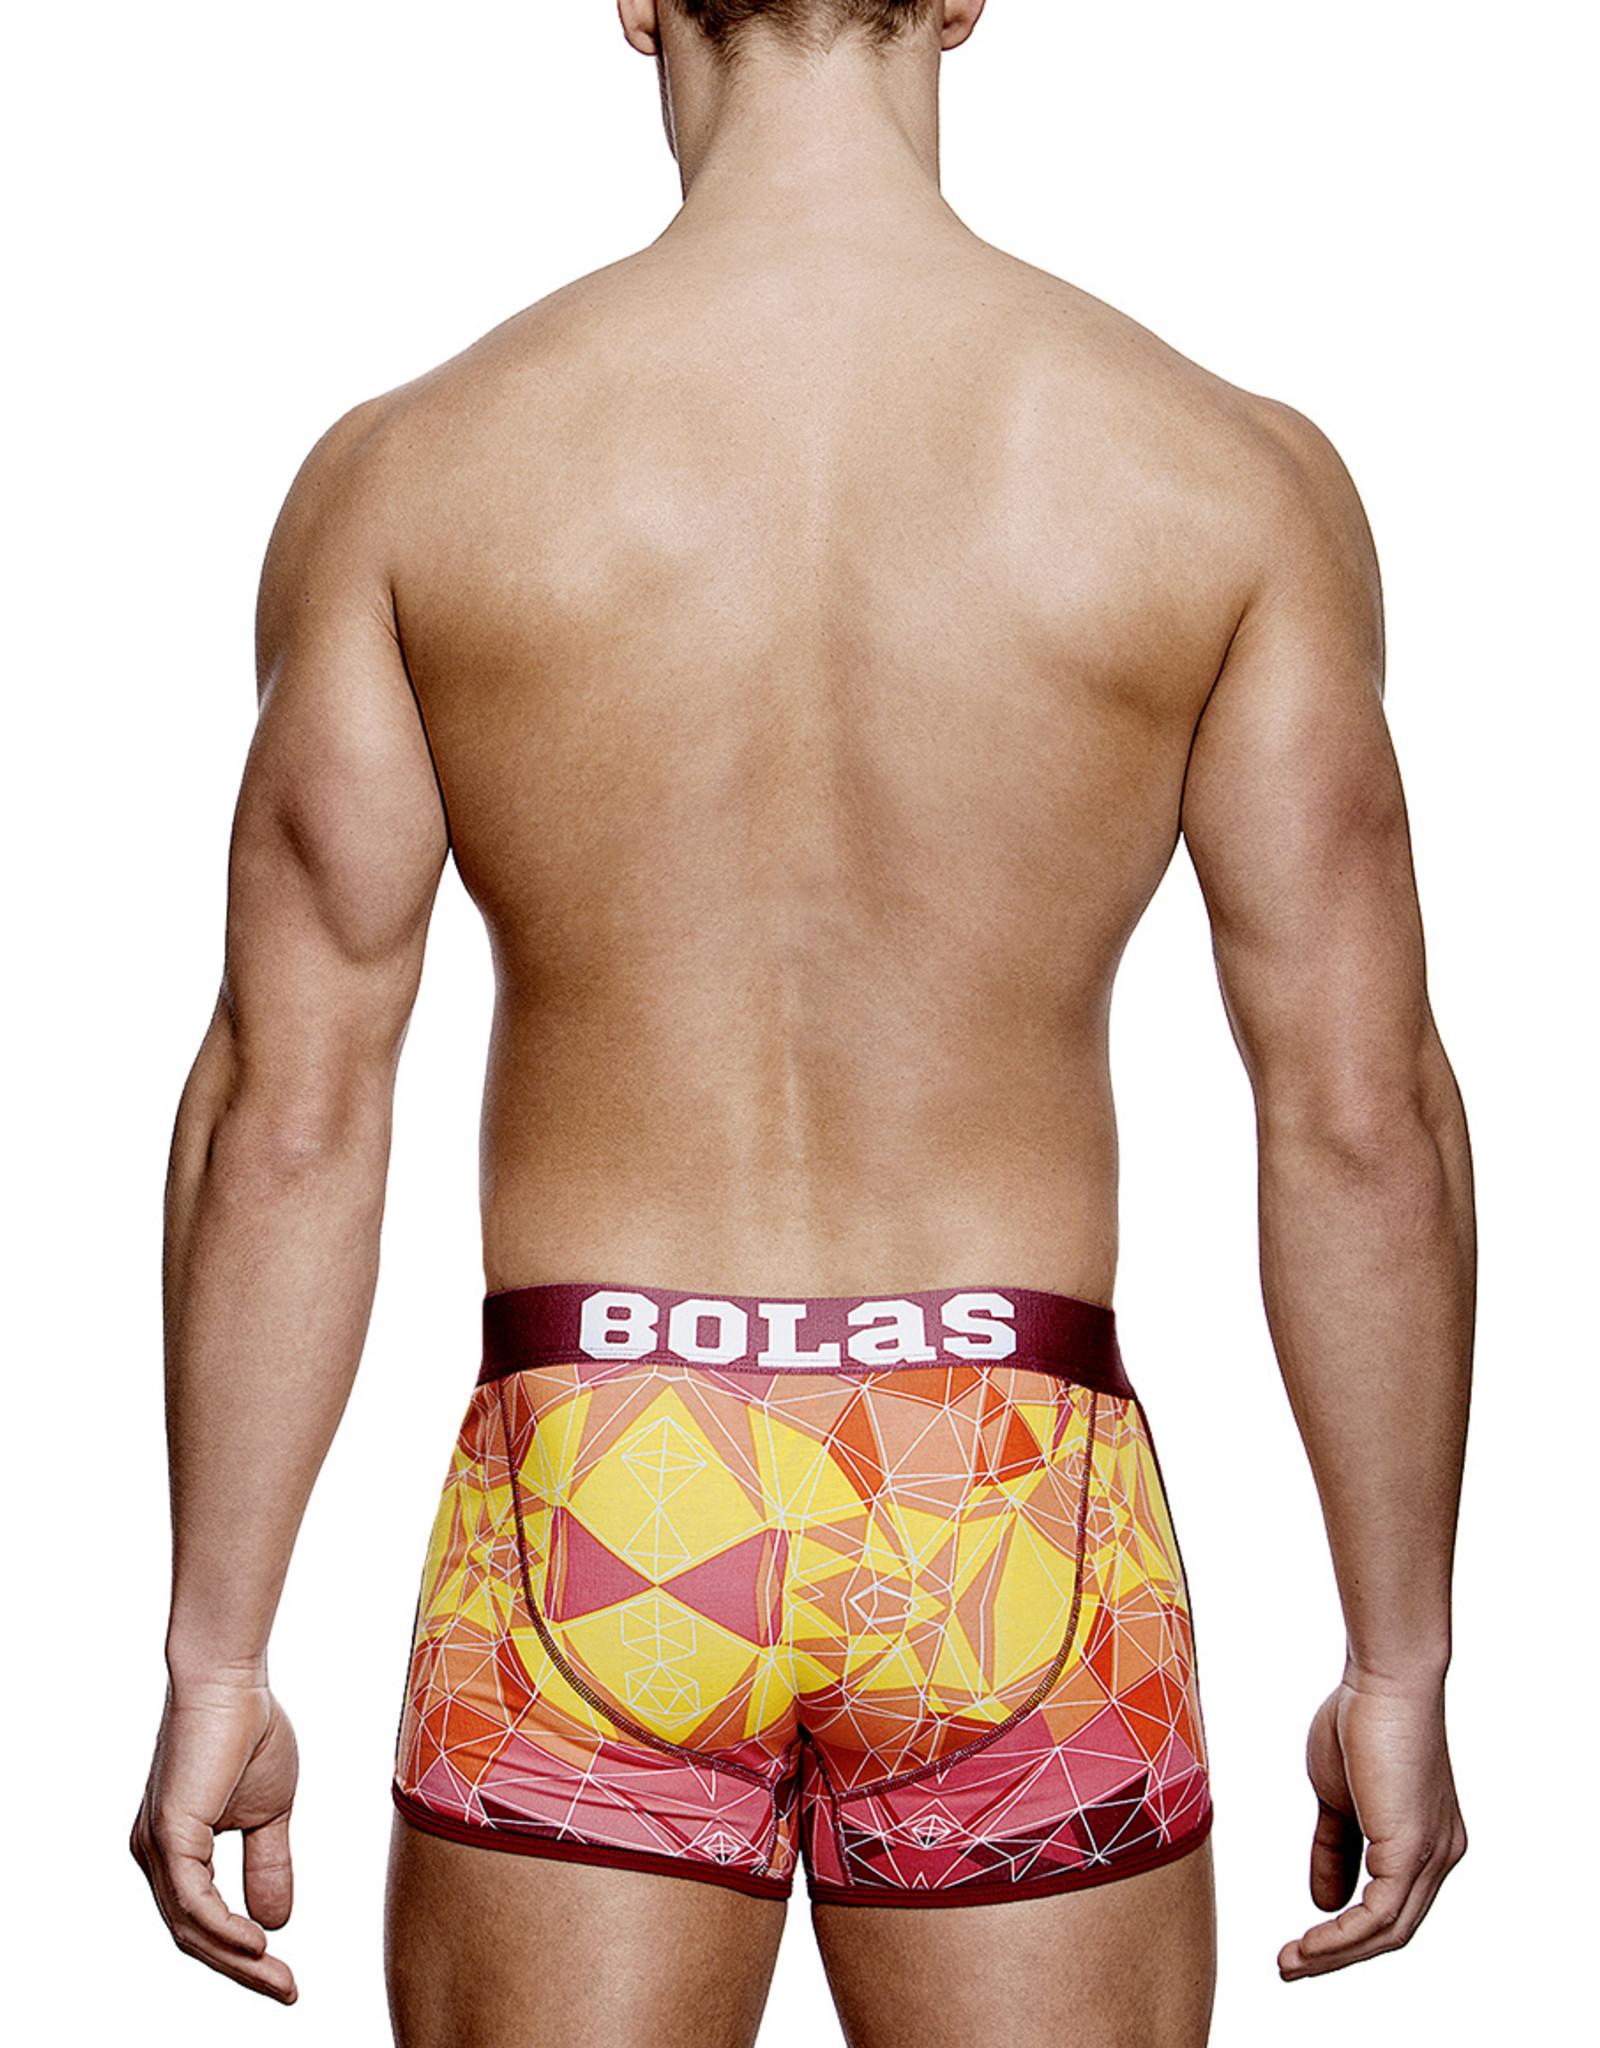 Bolas Underwear Fire